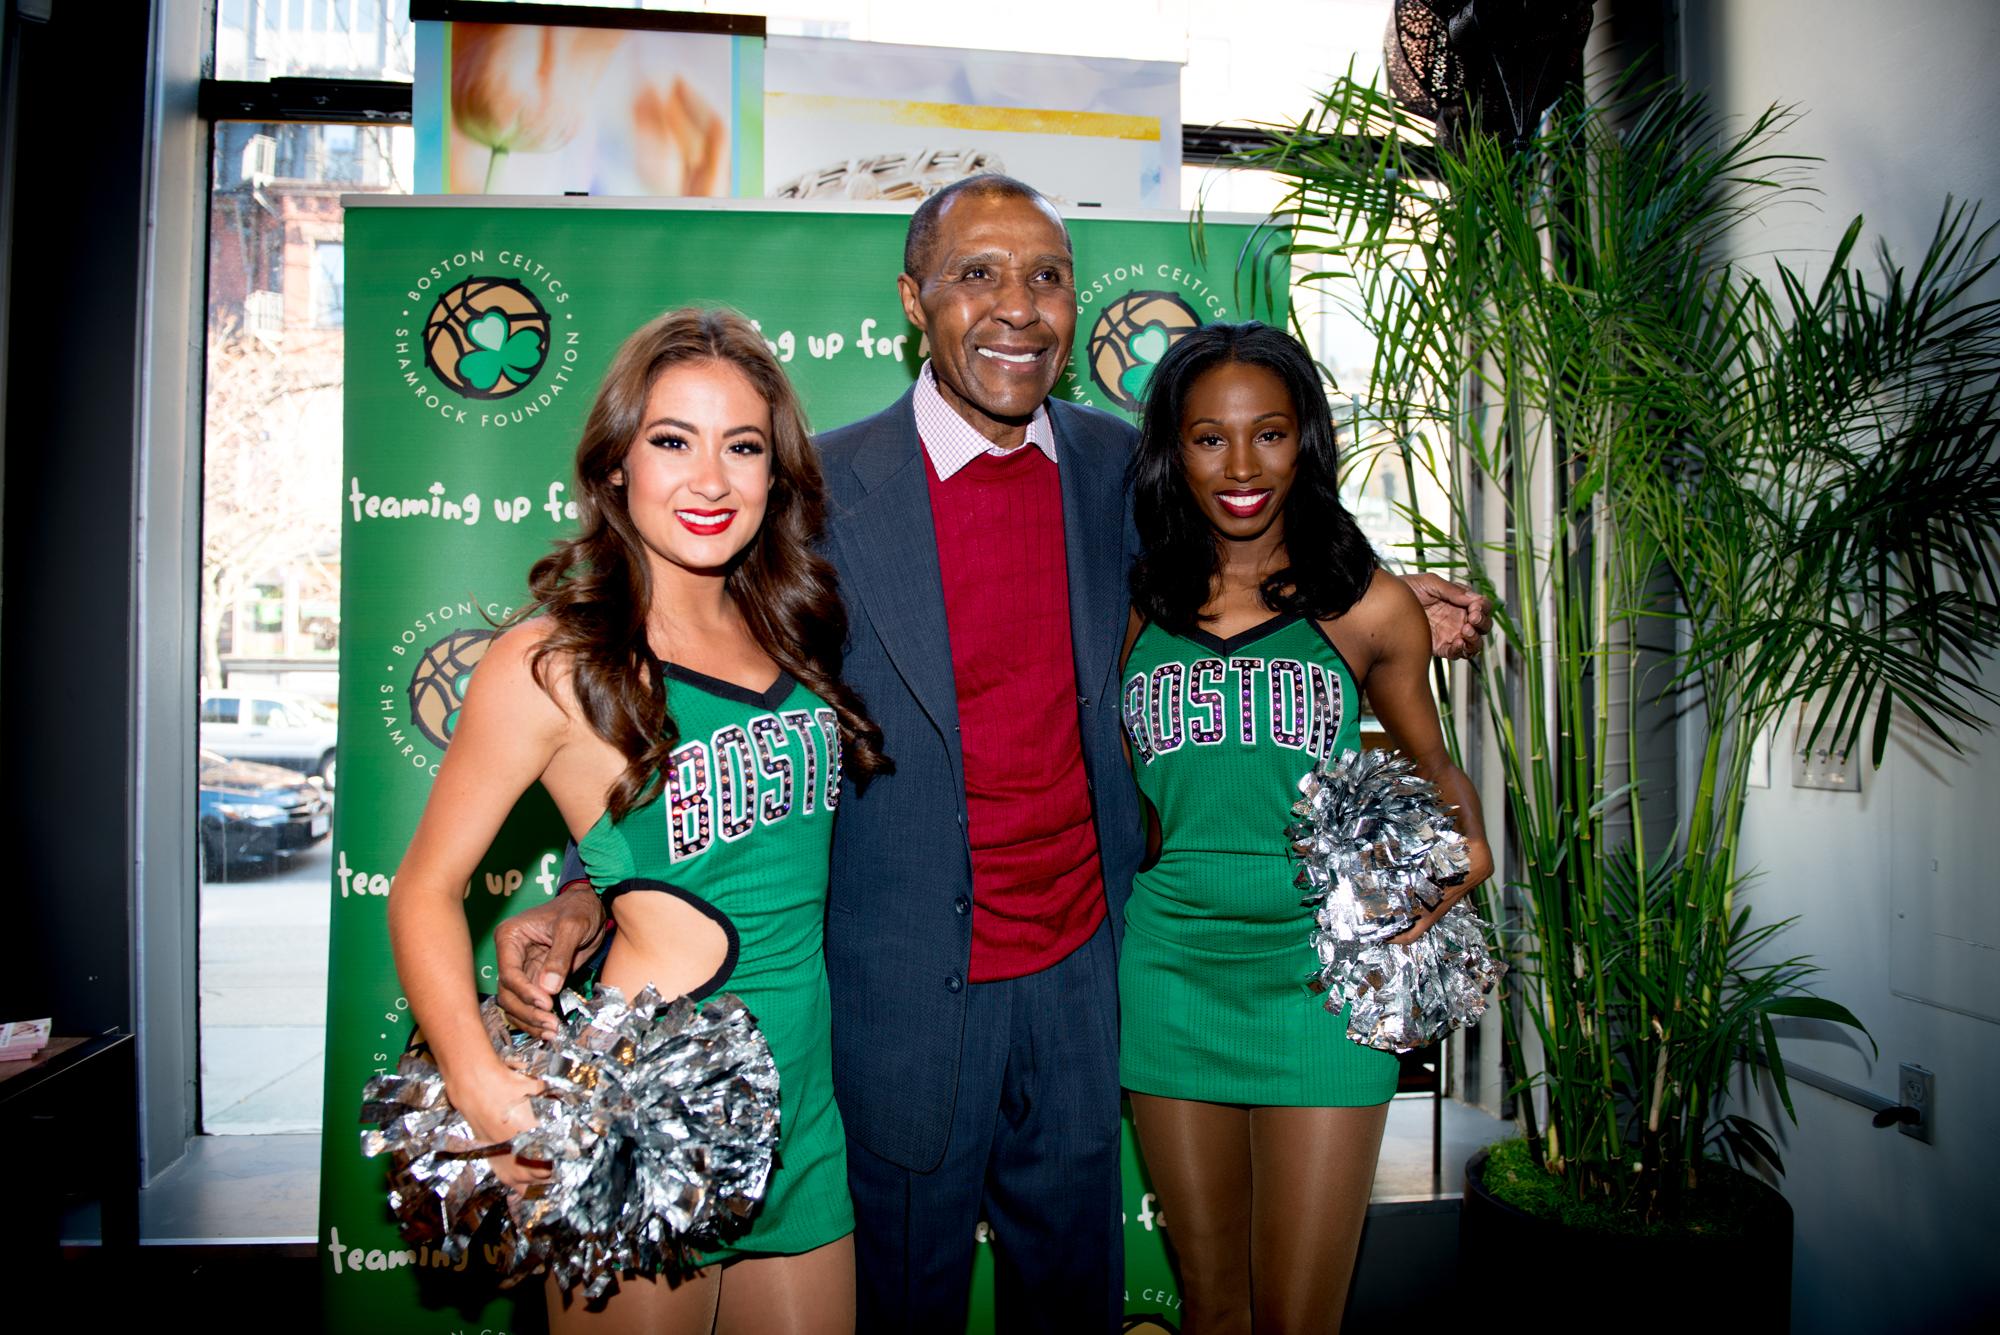 Celtics_Alex_Ani_032916-26.jpg